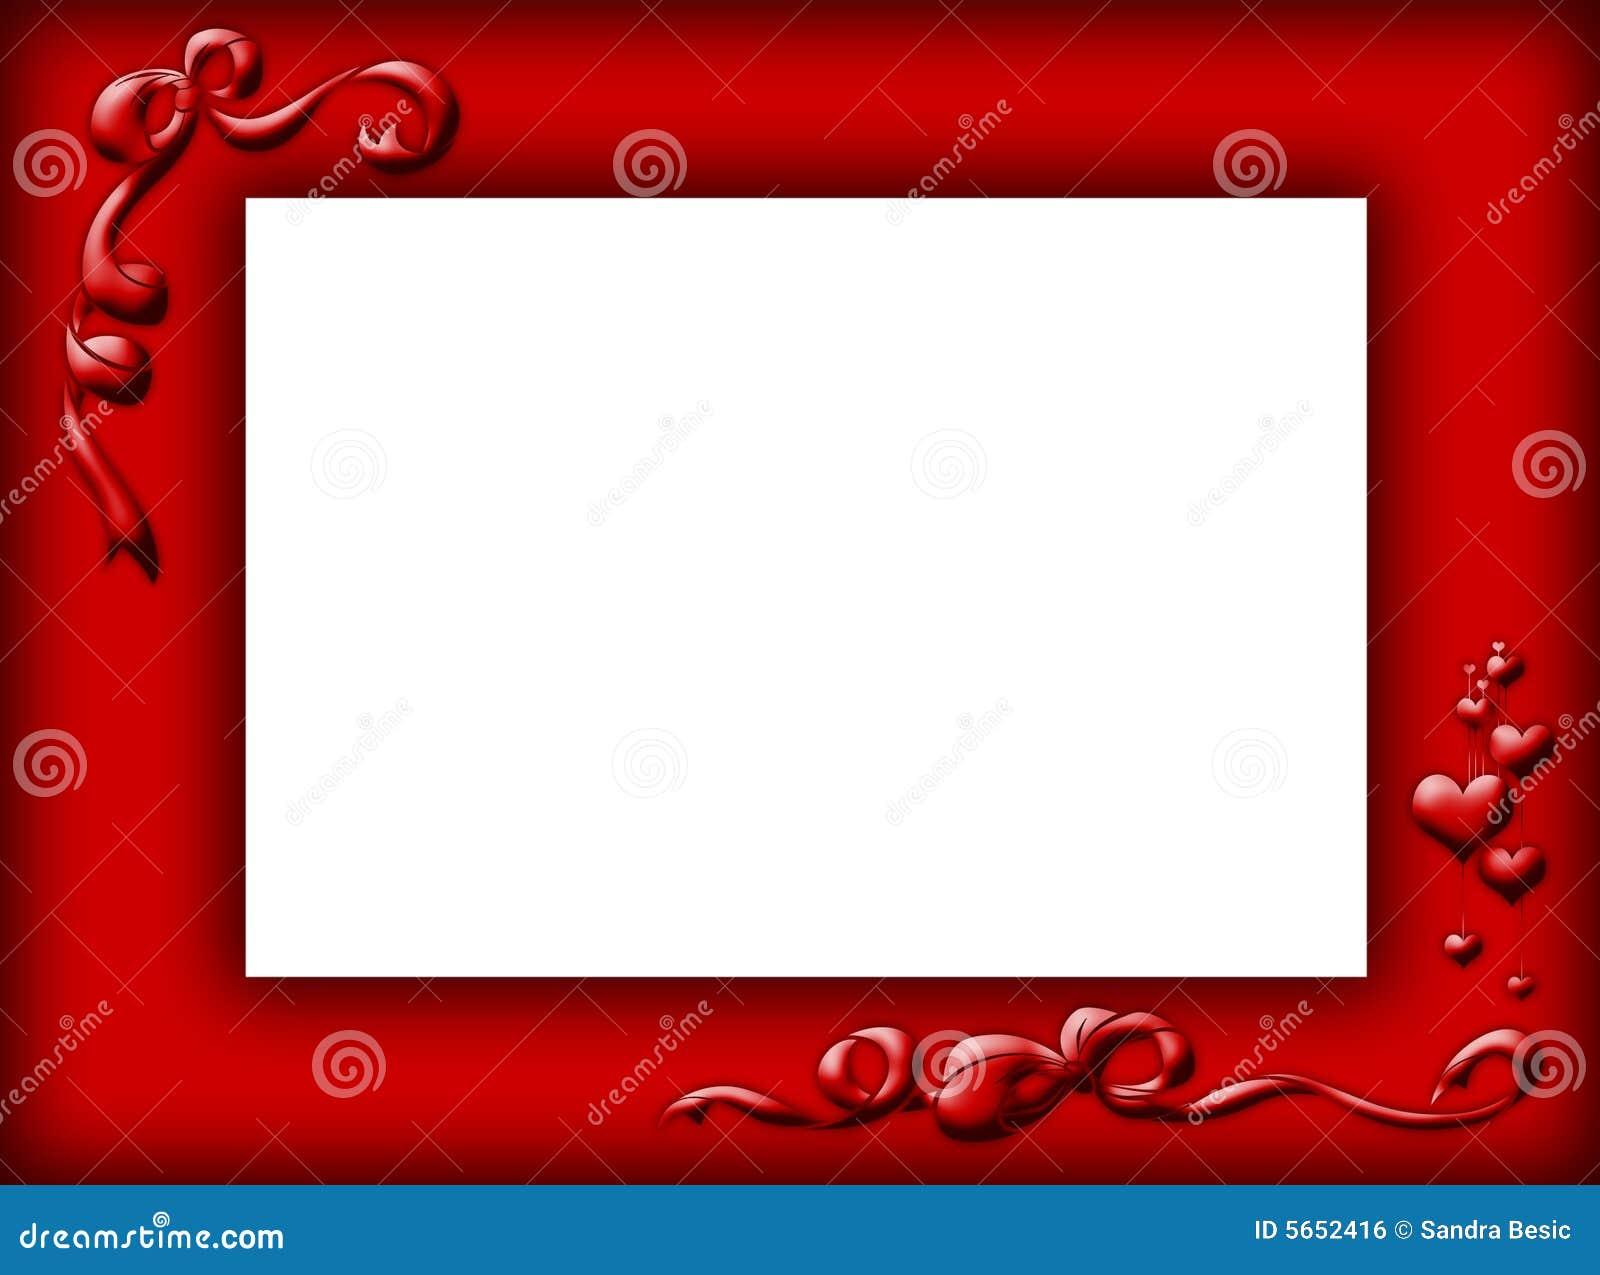 Red Border Royalty Free Stock Image - Image: 5652416